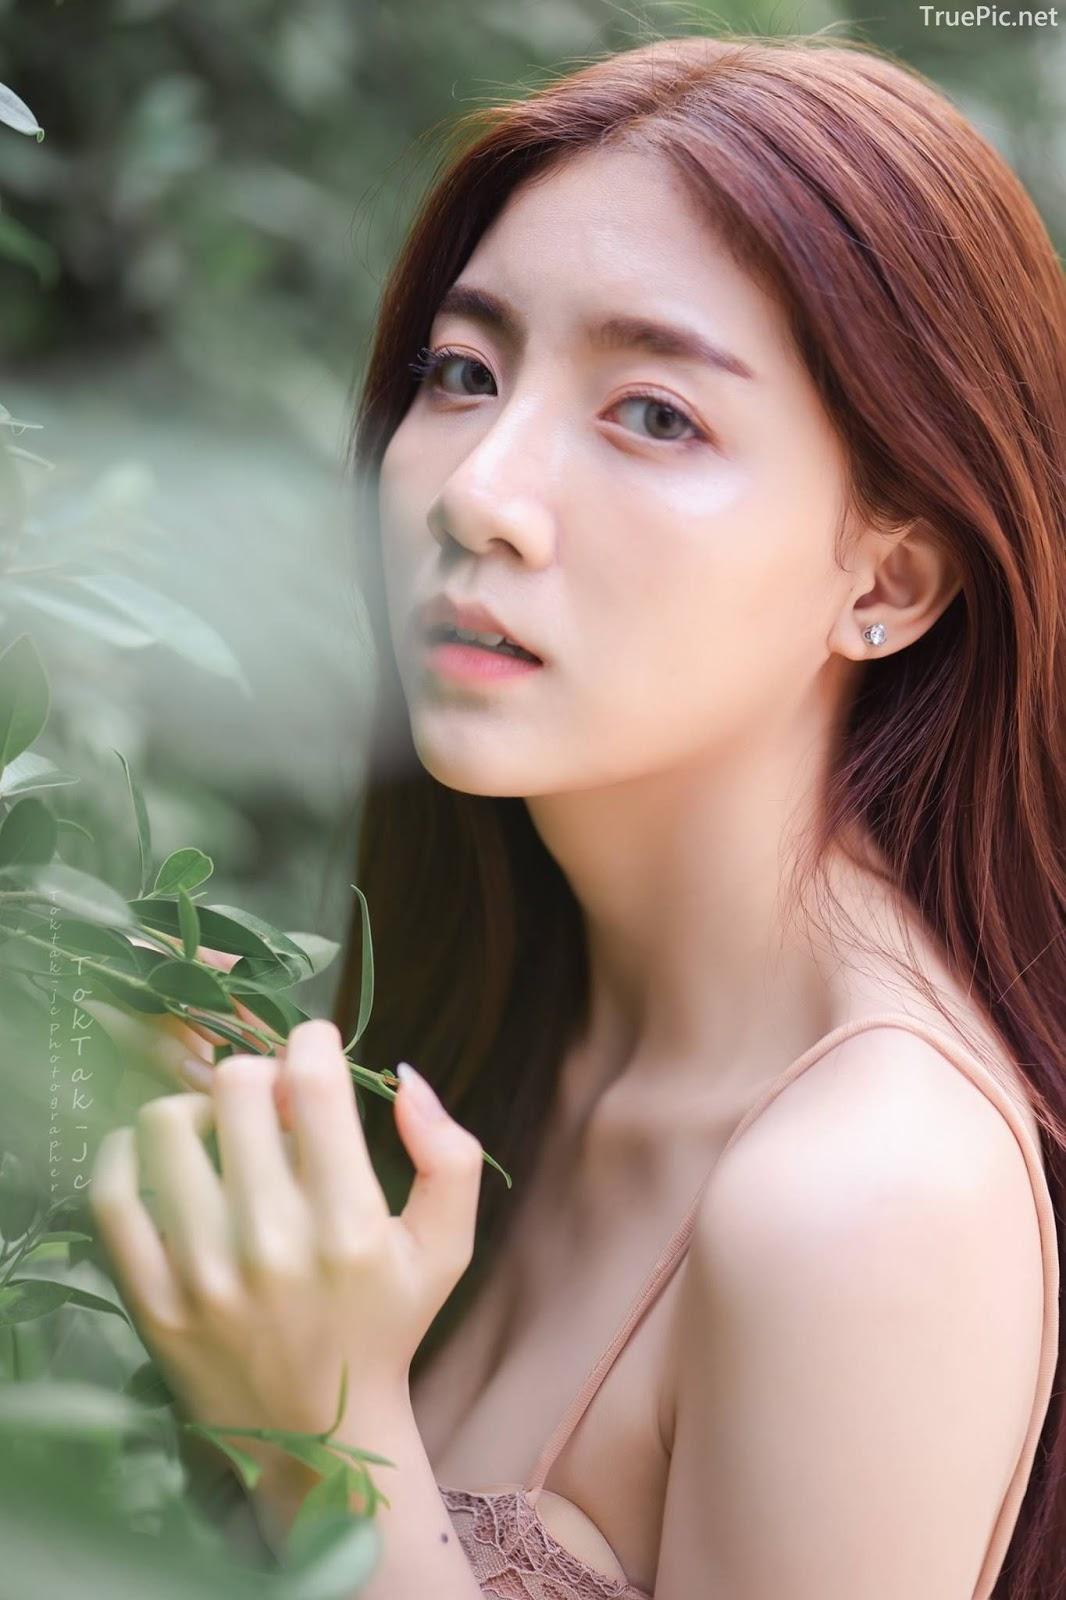 Thailand angel model Sasi Ngiunwan - Beauty portrait photoshoot - Picture 5